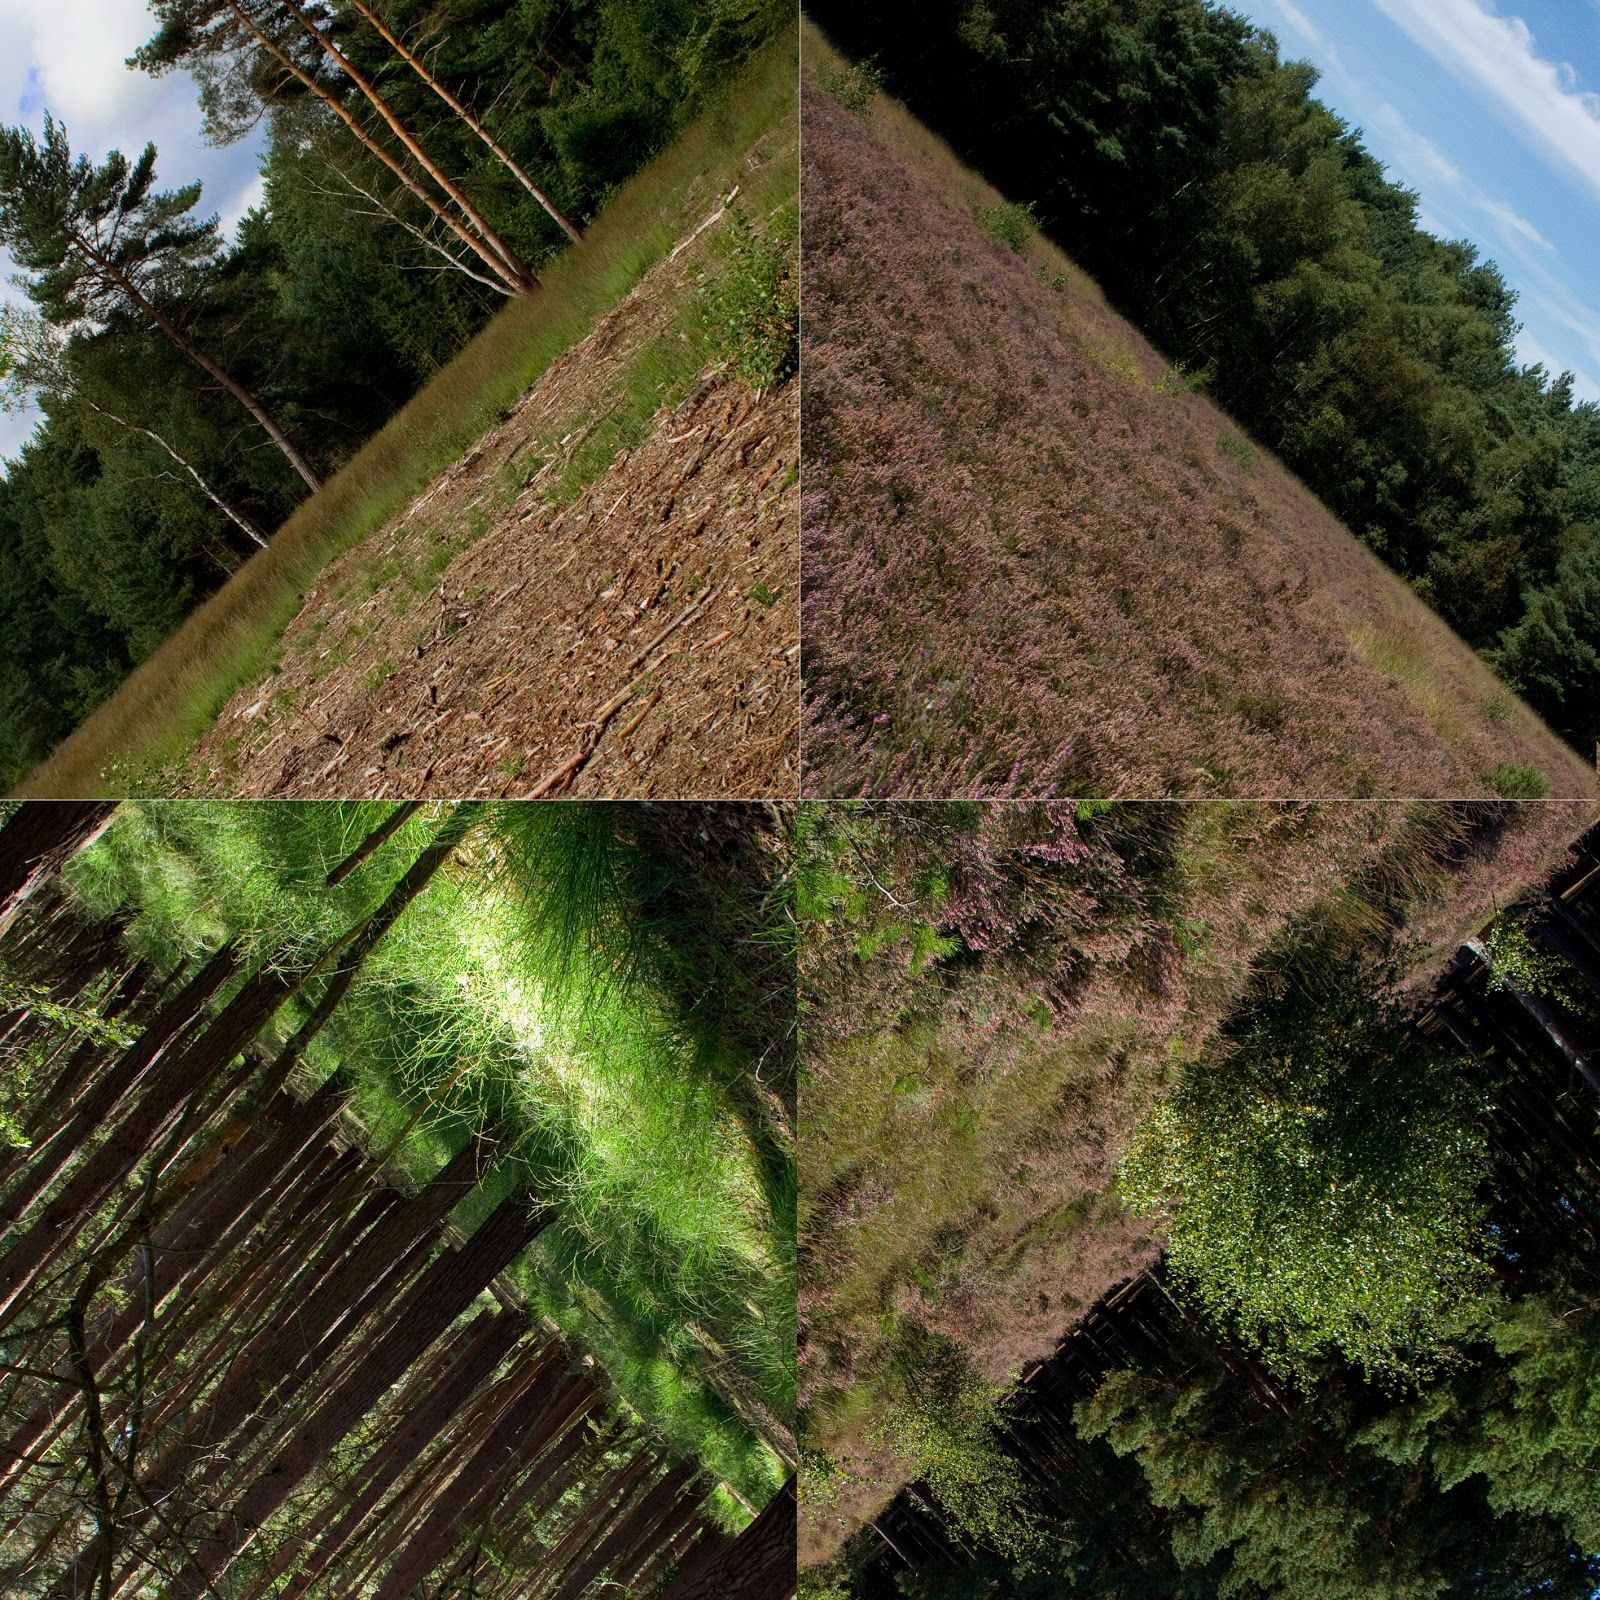 Doug Aitken Photography Bing Images Landscape Photography Creative Landscape Geometric Photography